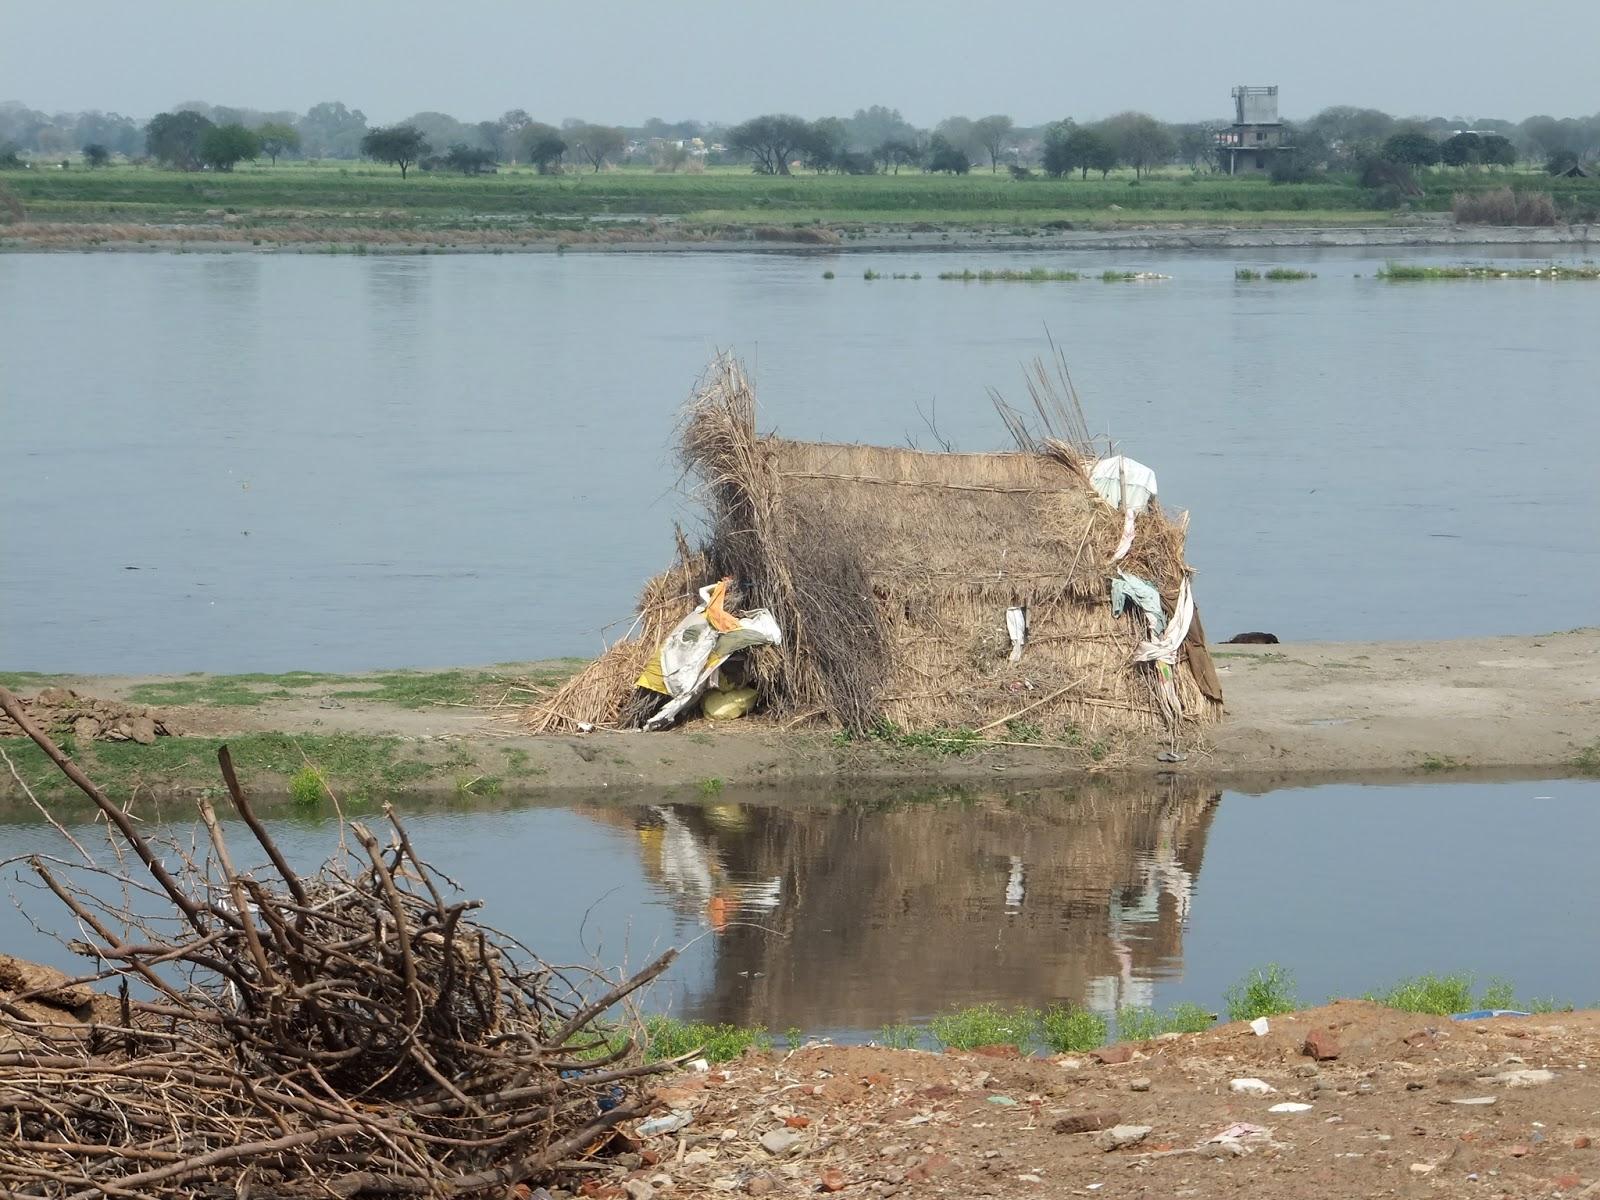 шалаш в Индии на берегу реки